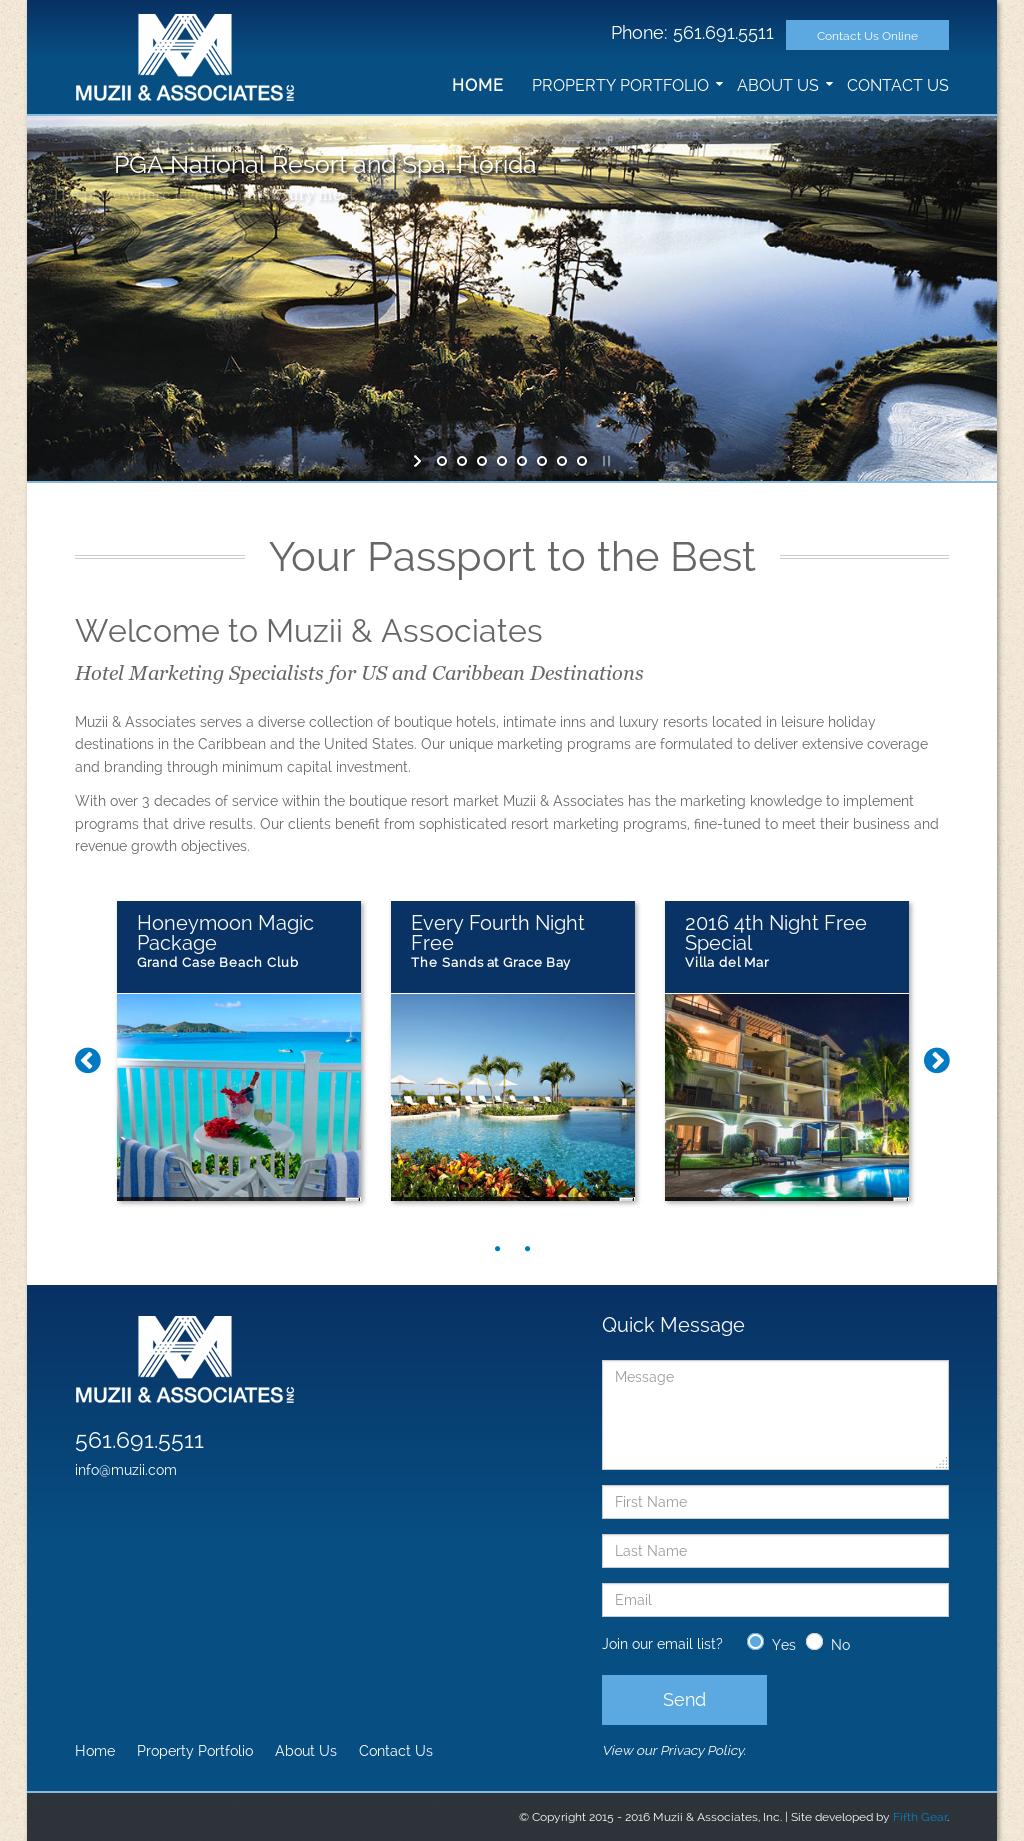 Muzii & Associates Competitors, Revenue and Employees